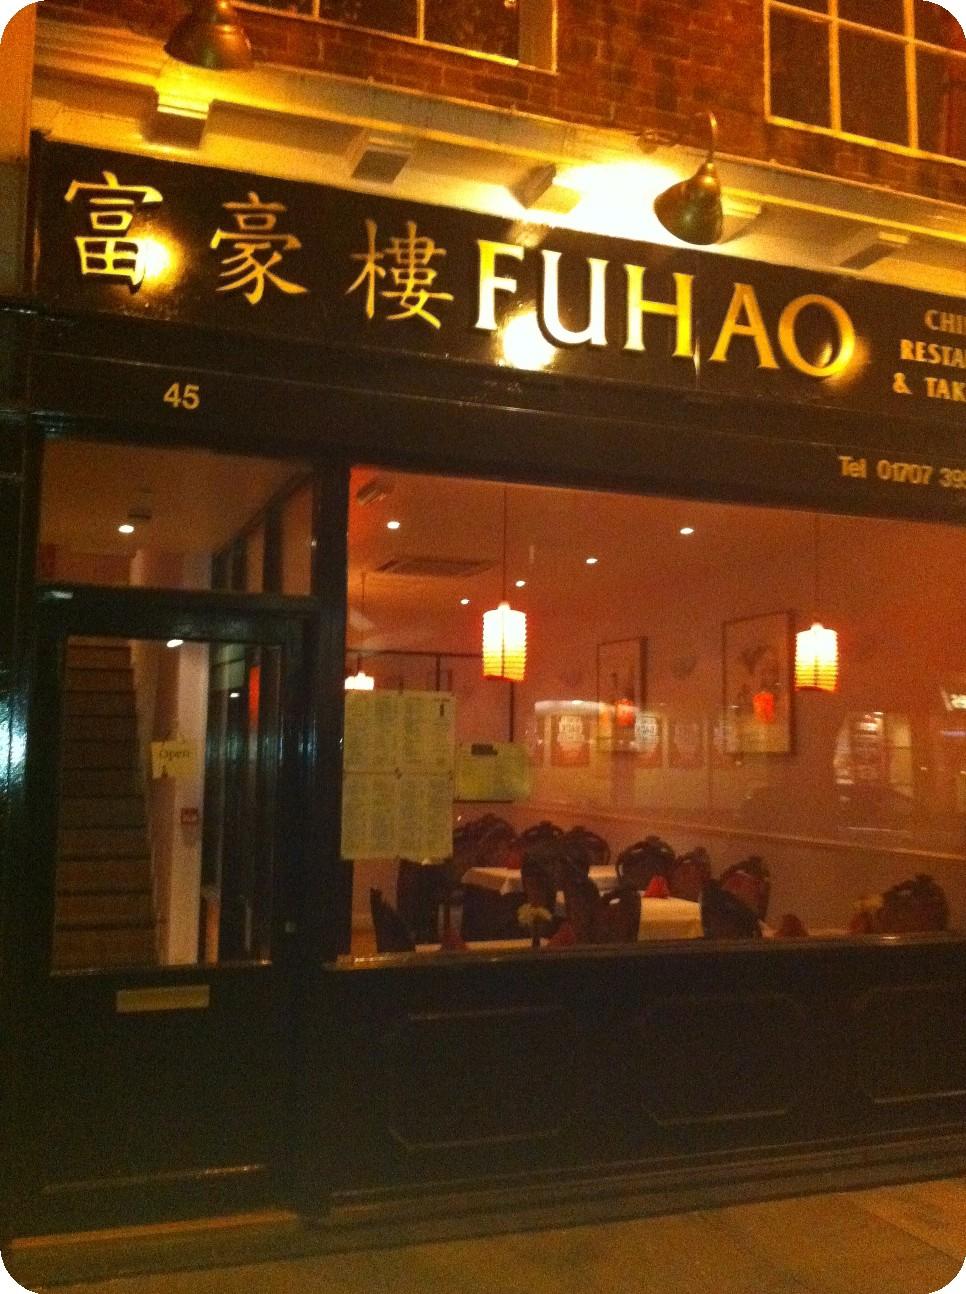 Fu Hao Restaurant Home 01707 395 605 Welwyn Garden City